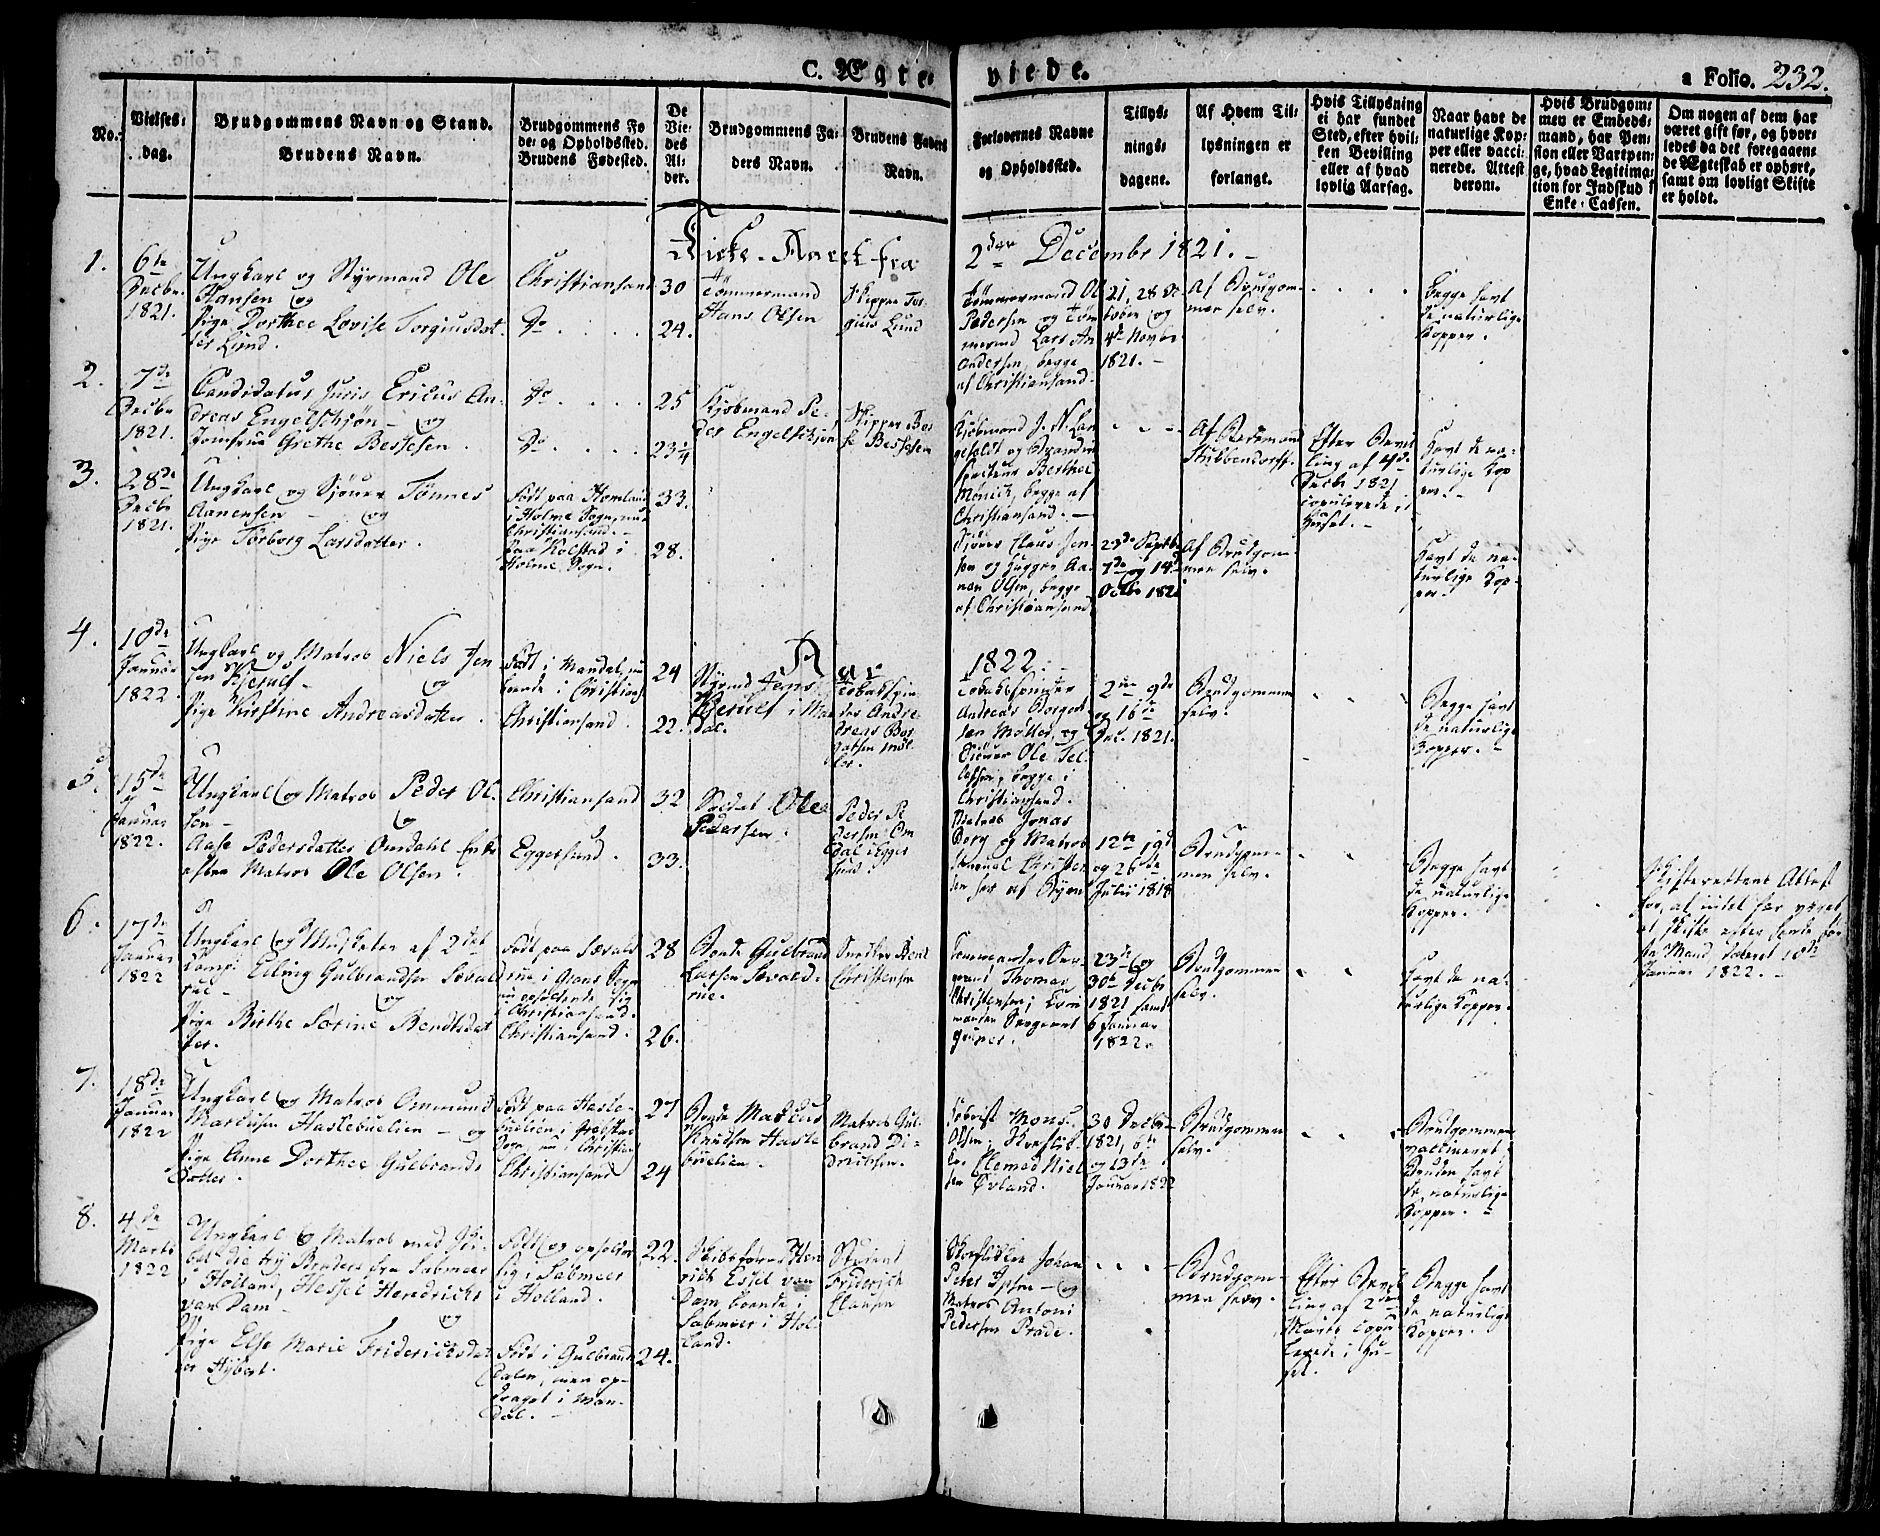 SAK, Kristiansand domprosti, F/Fa/L0009: Ministerialbok nr. A 9, 1821-1827, s. 232